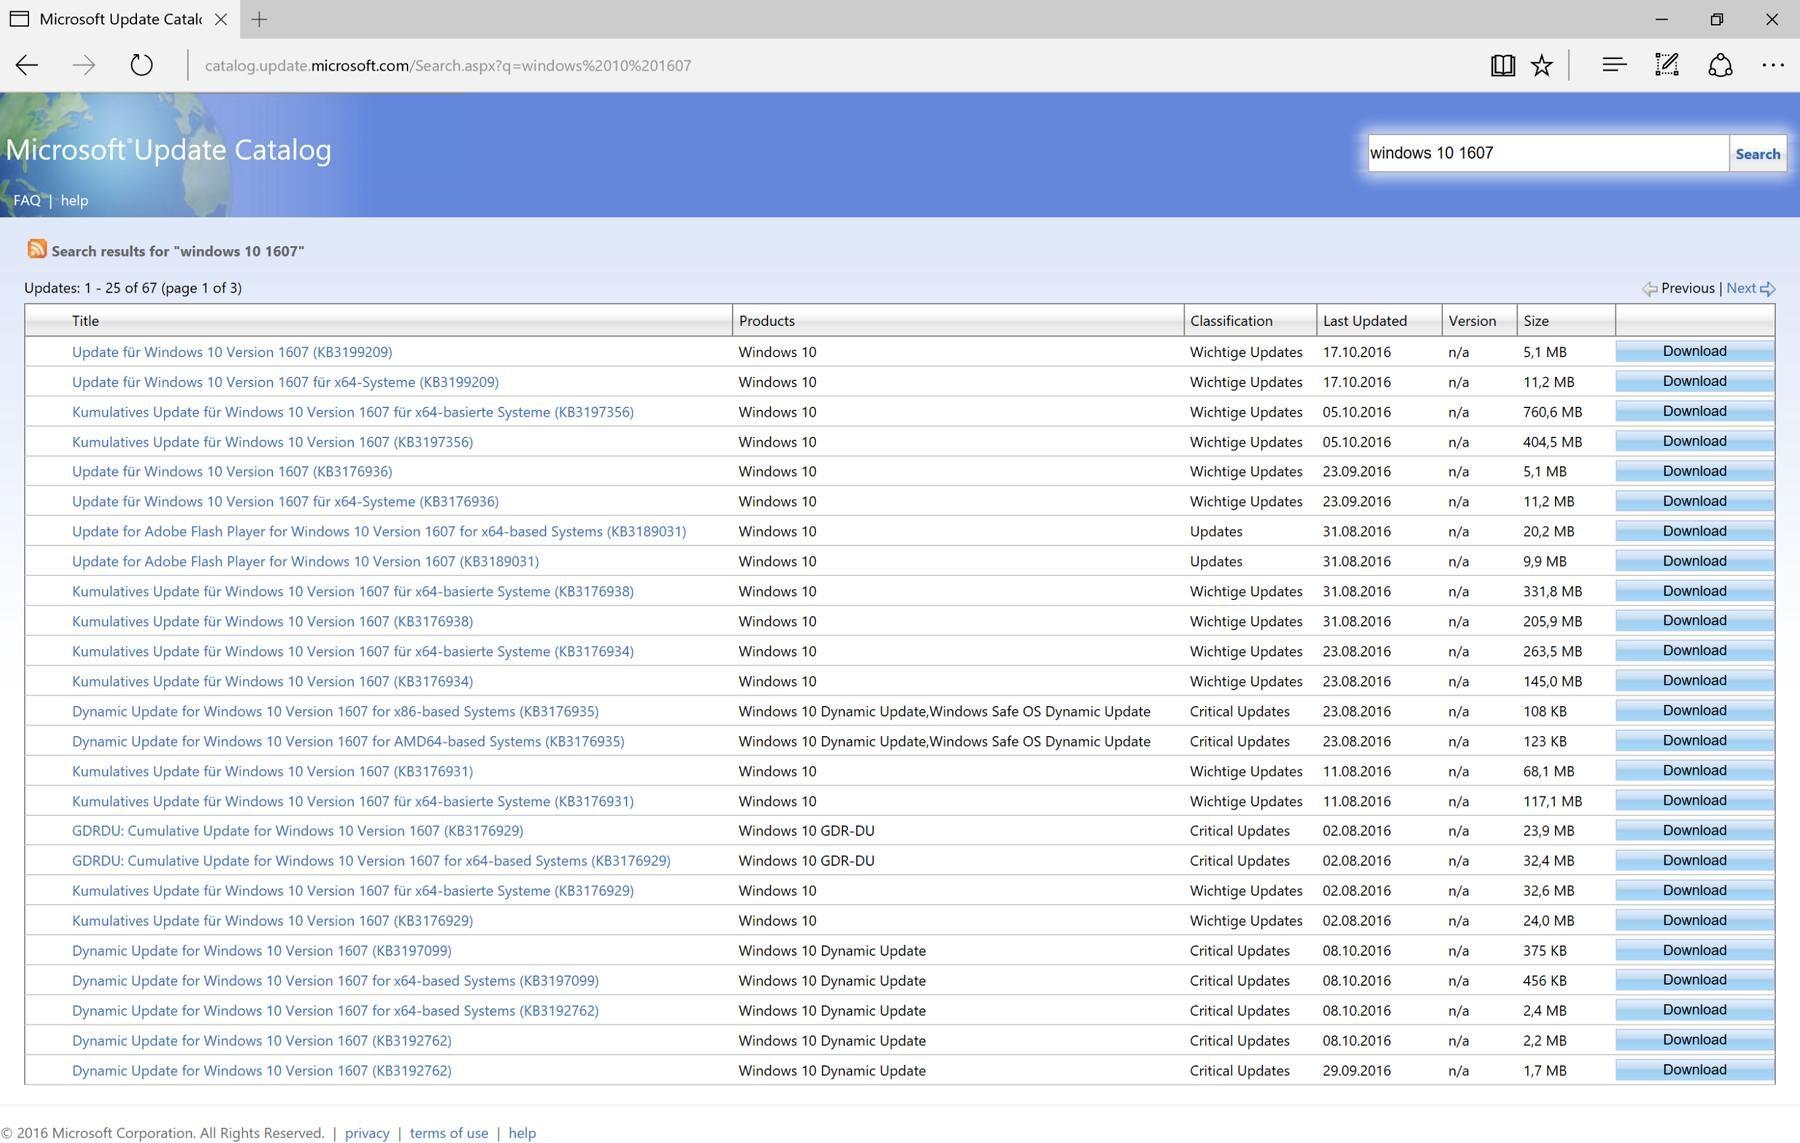 Microsoft Update Catalog Edge